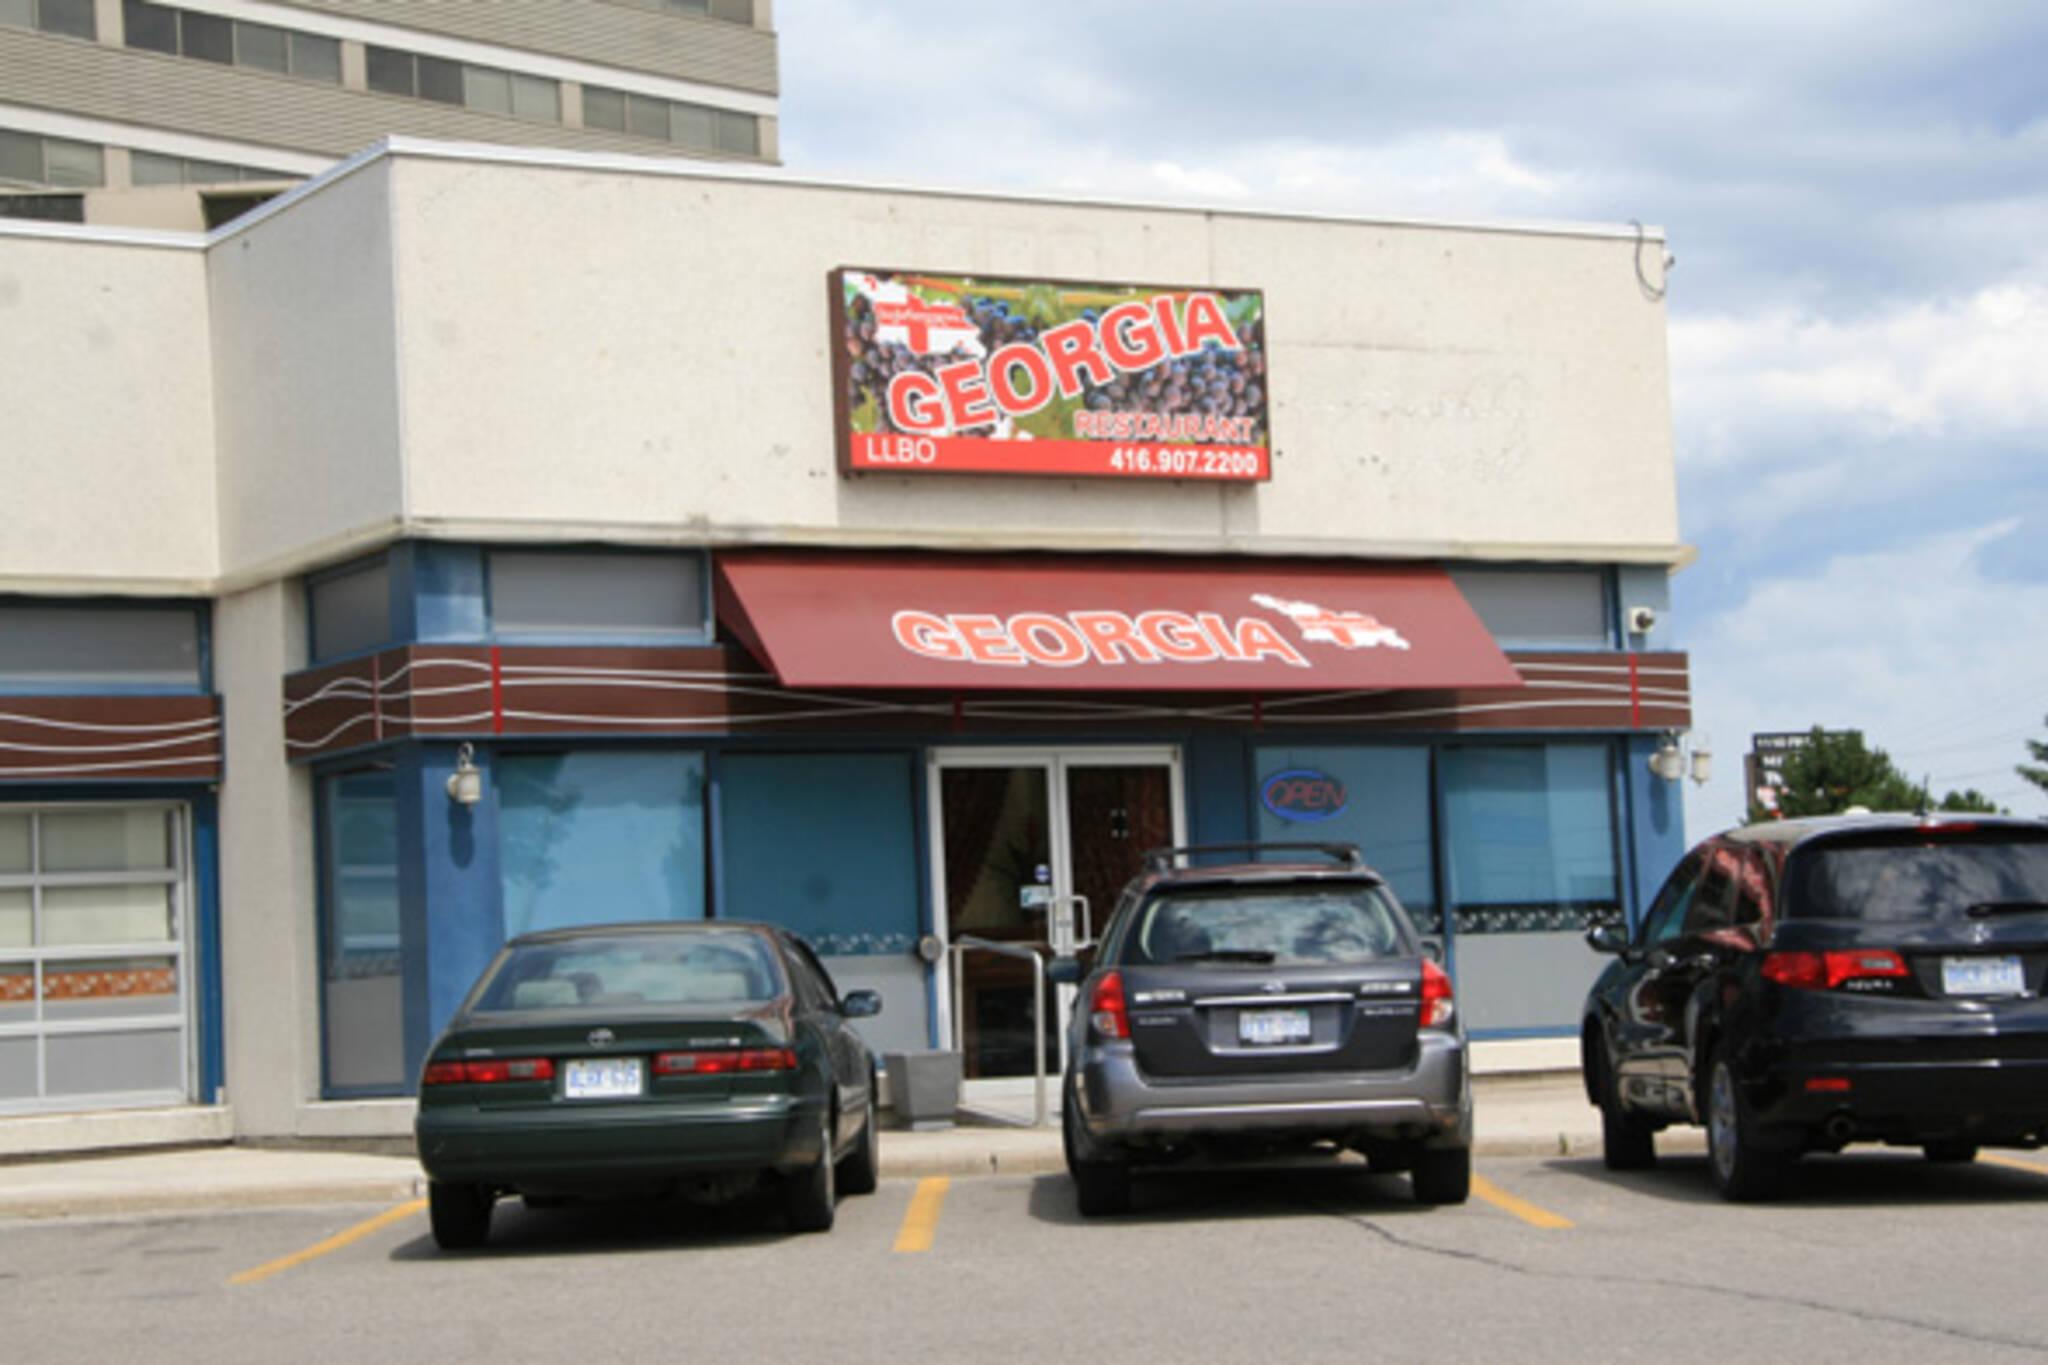 Georgia Restaurant Toronto